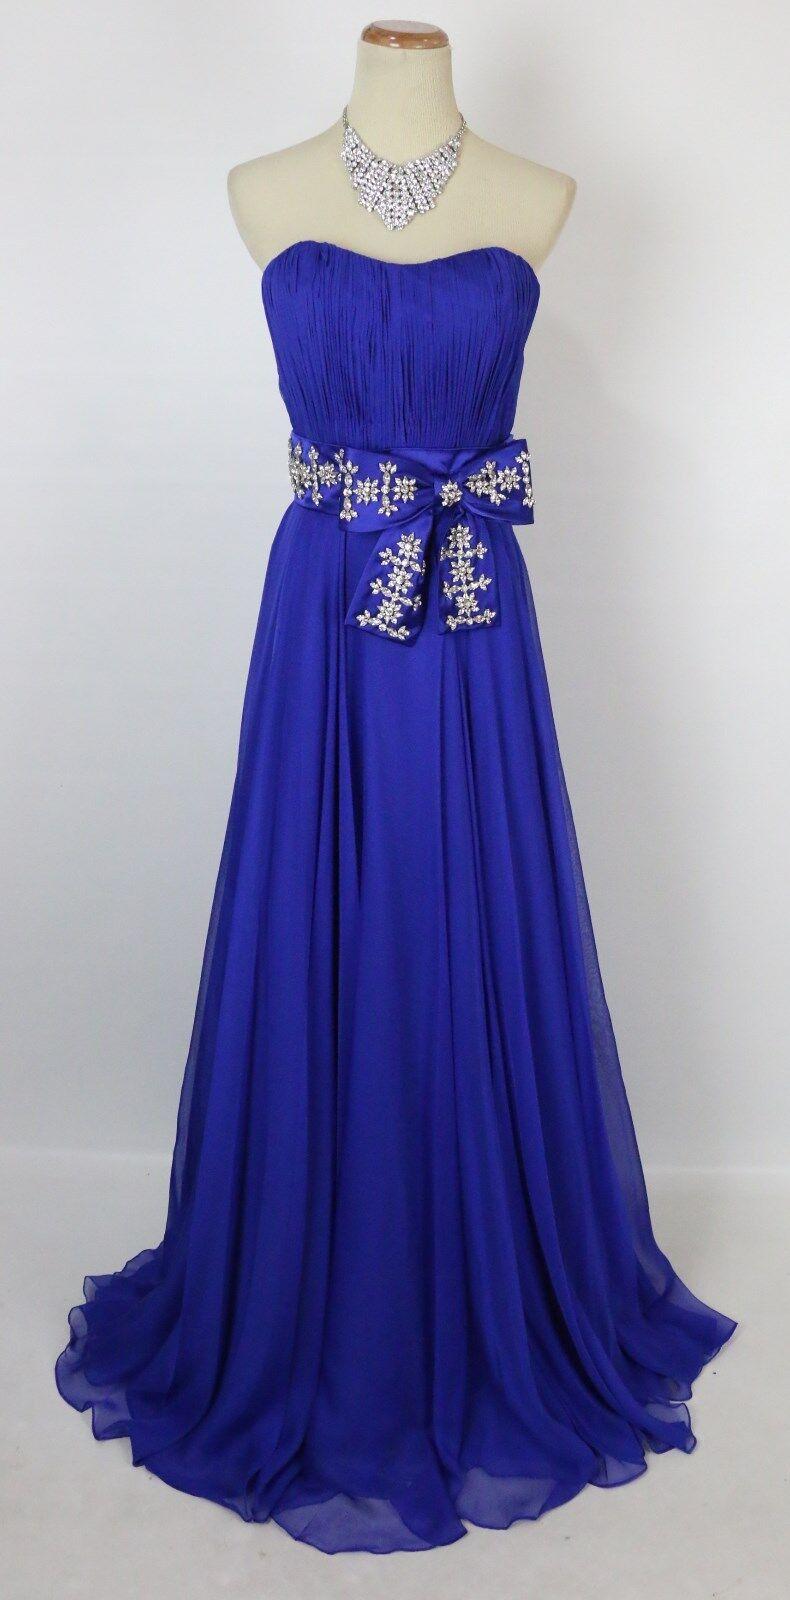 nyA  590 Jovani Ruched Strapless Bodice Prom Formal Evening Dress Storlek 4 Royal